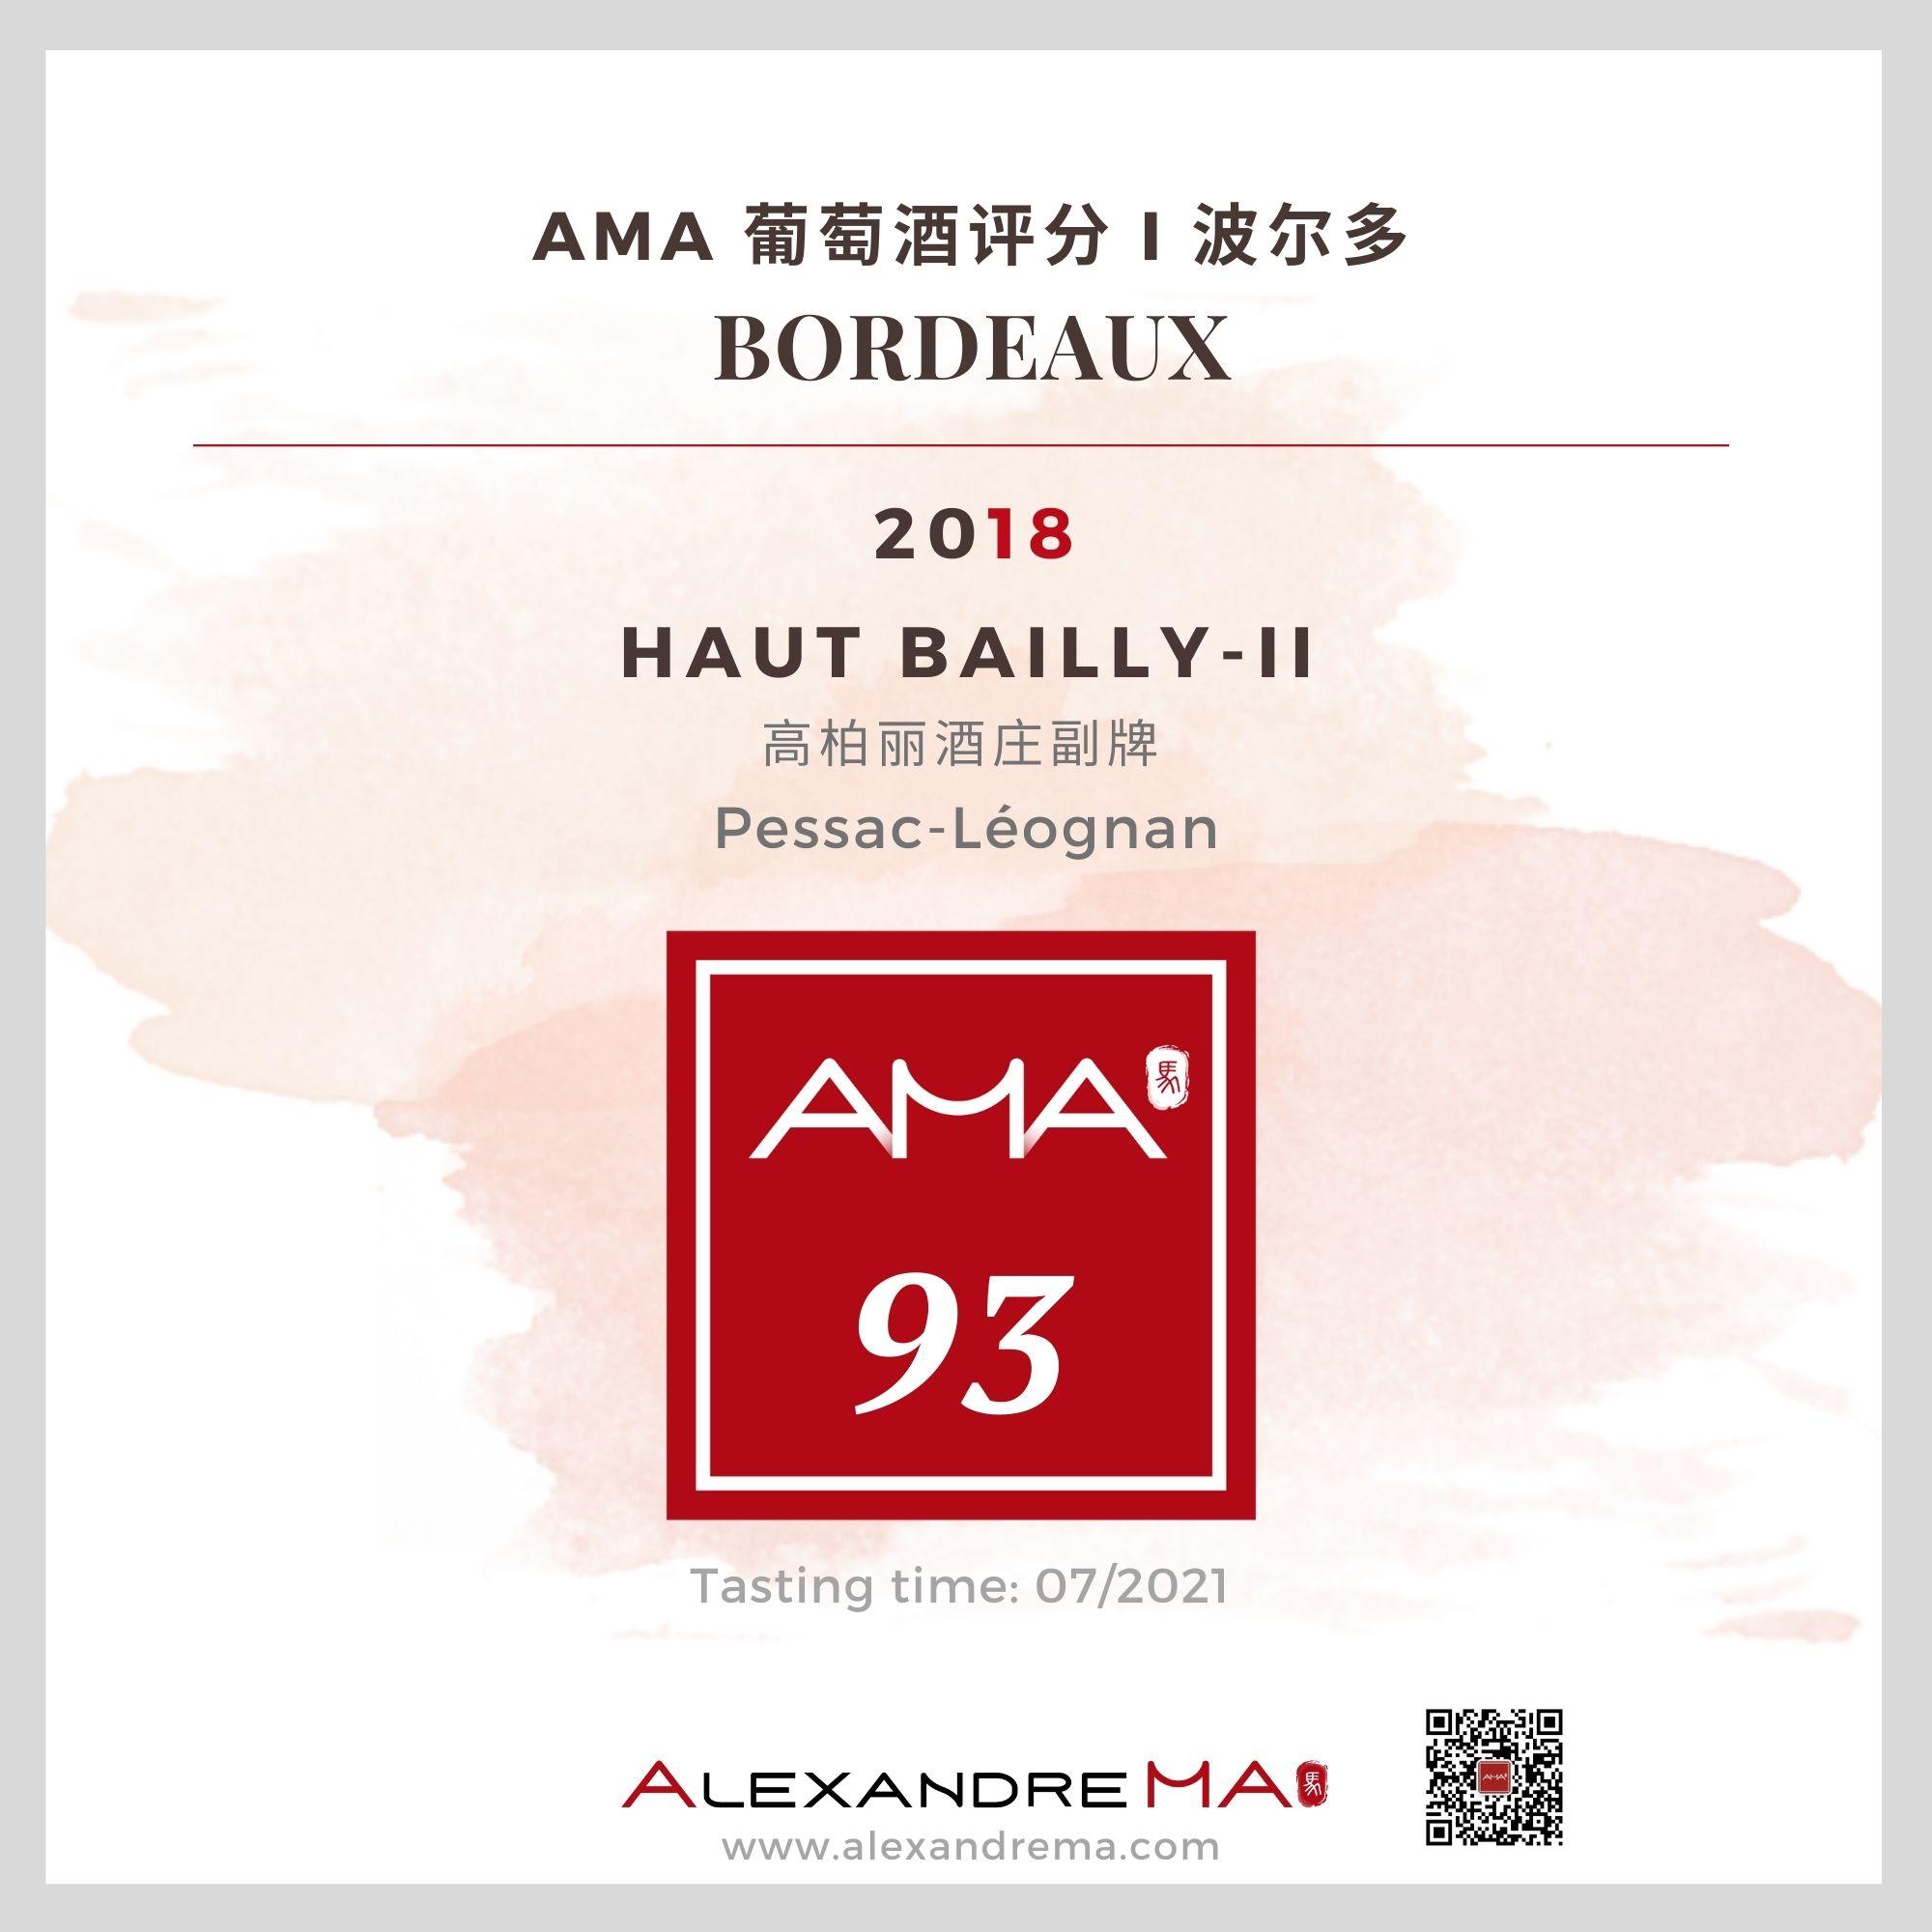 Château Haut-Bailly – Haut Bailly-II 2018 高柏丽副牌 - Alexandre Ma